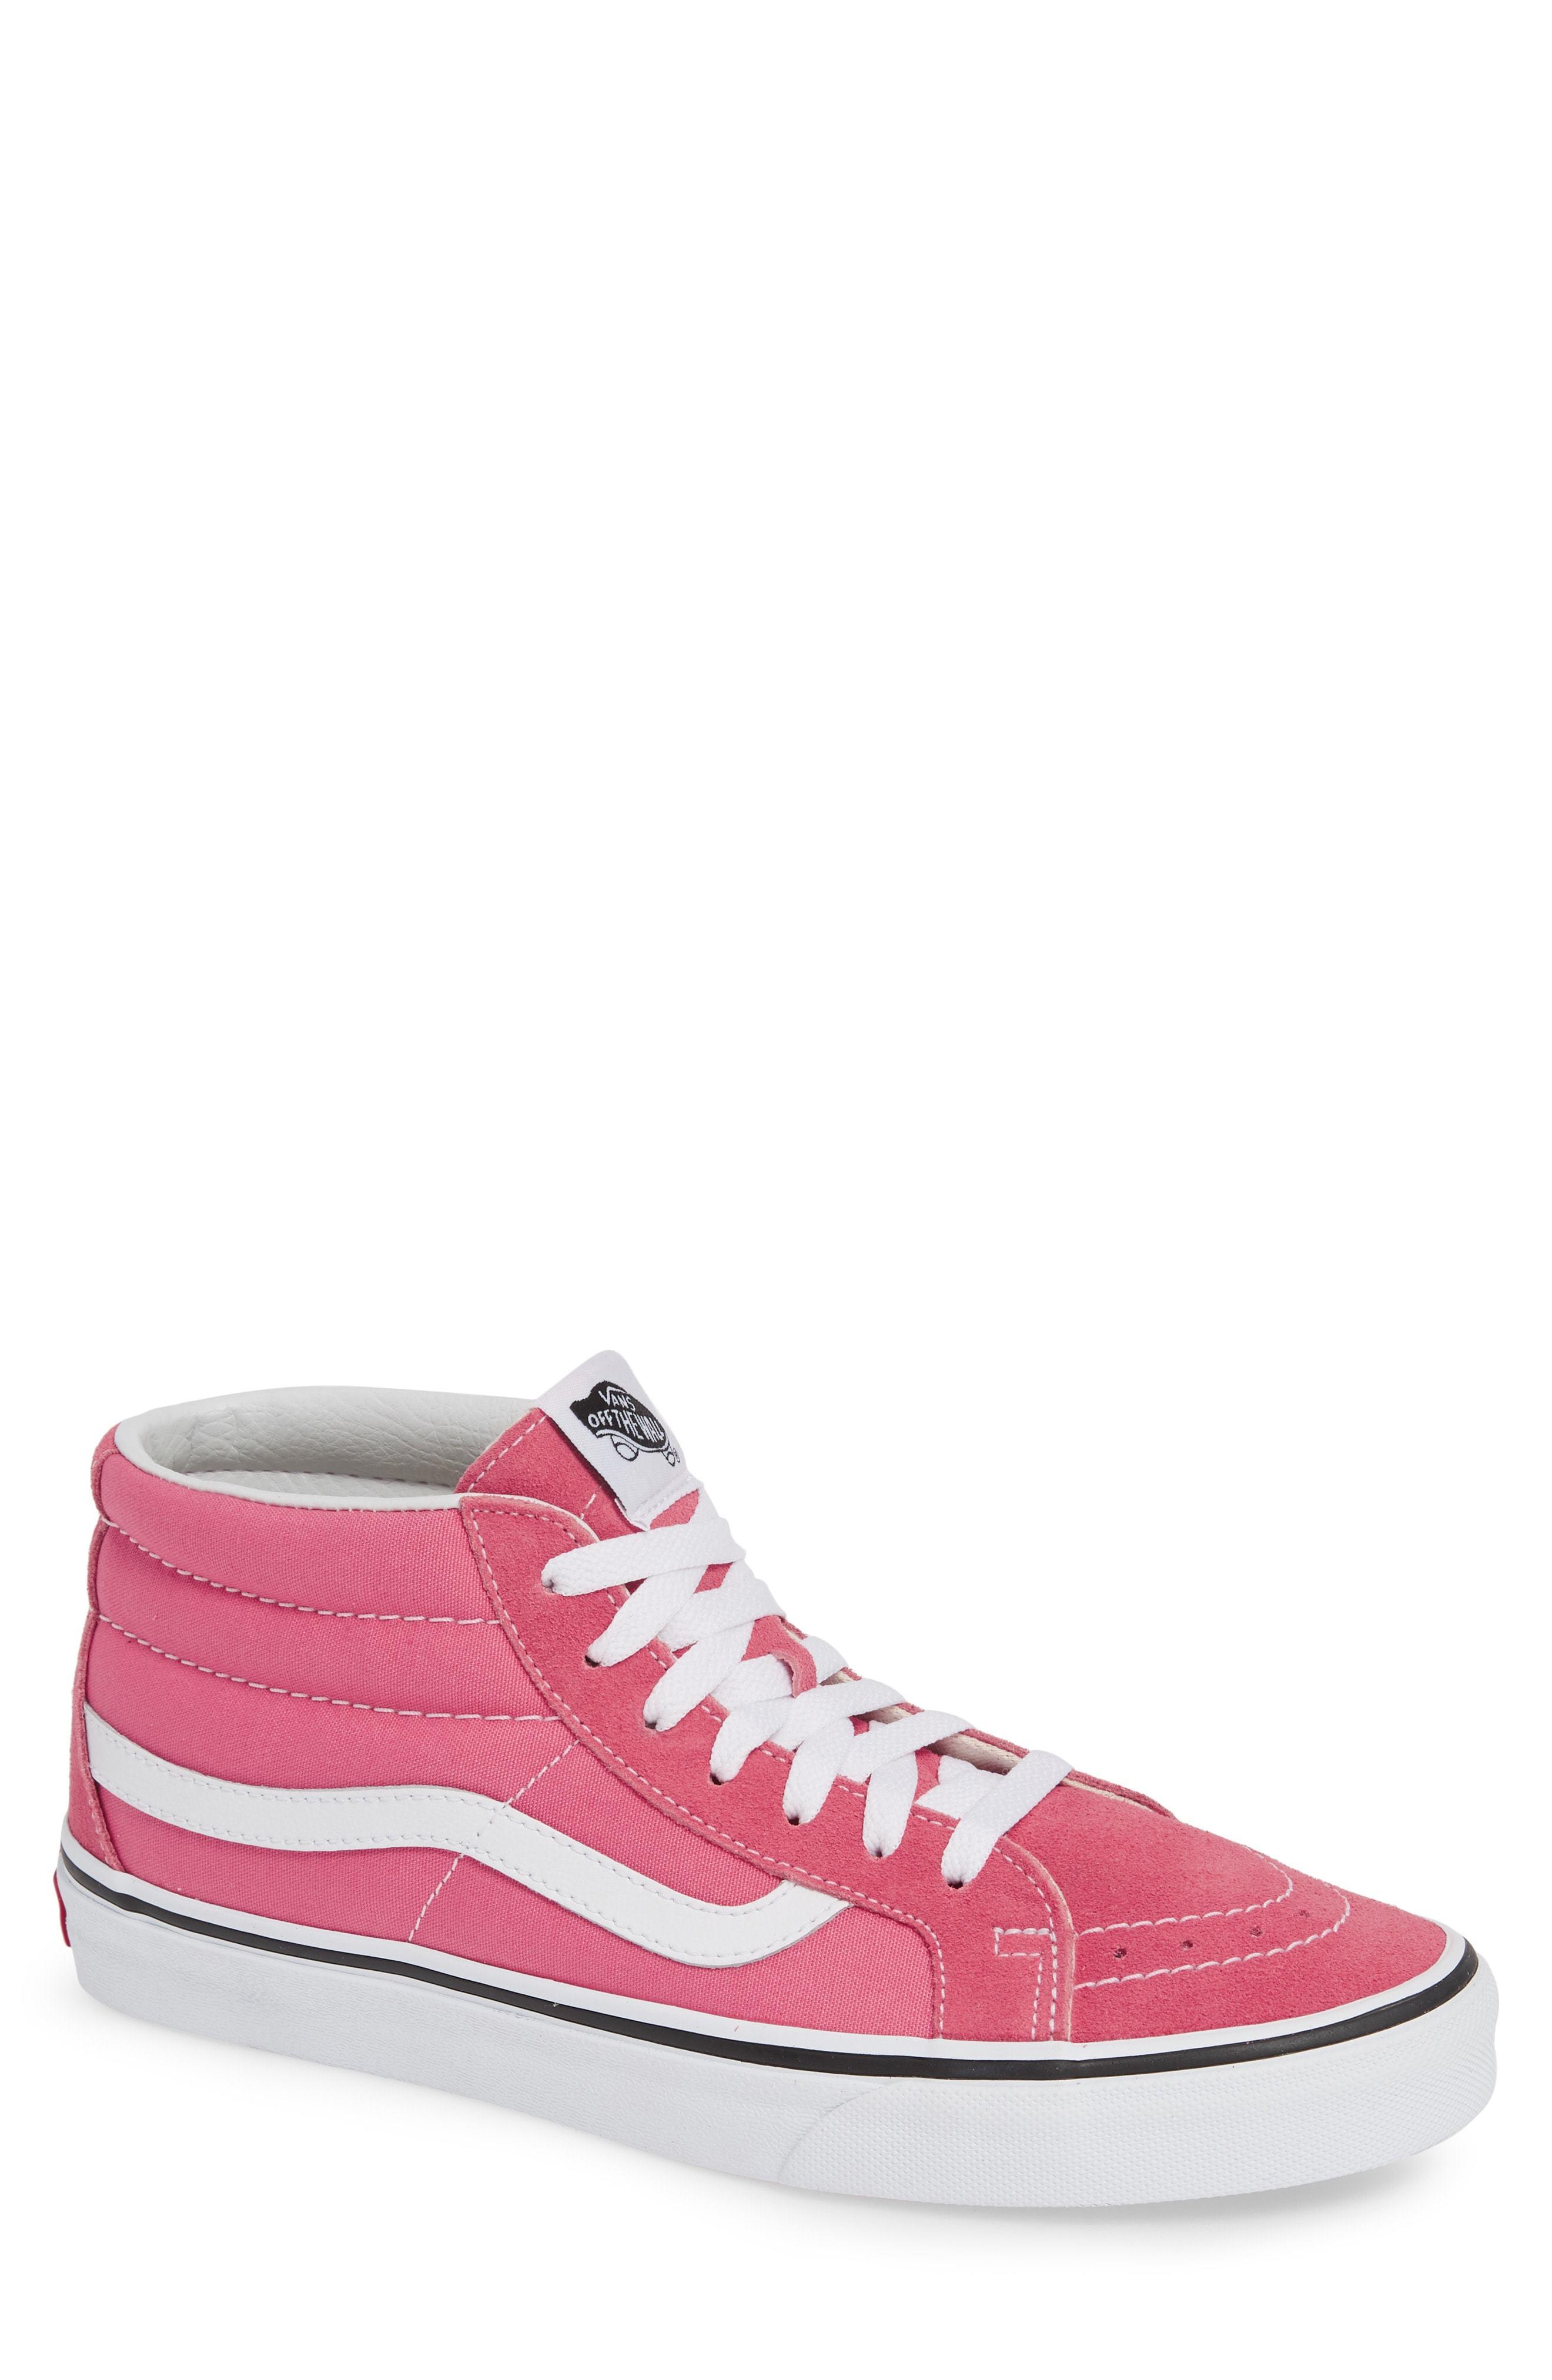 b590be2a2a ... Vans Sk8 Mid Reissue Sneaker